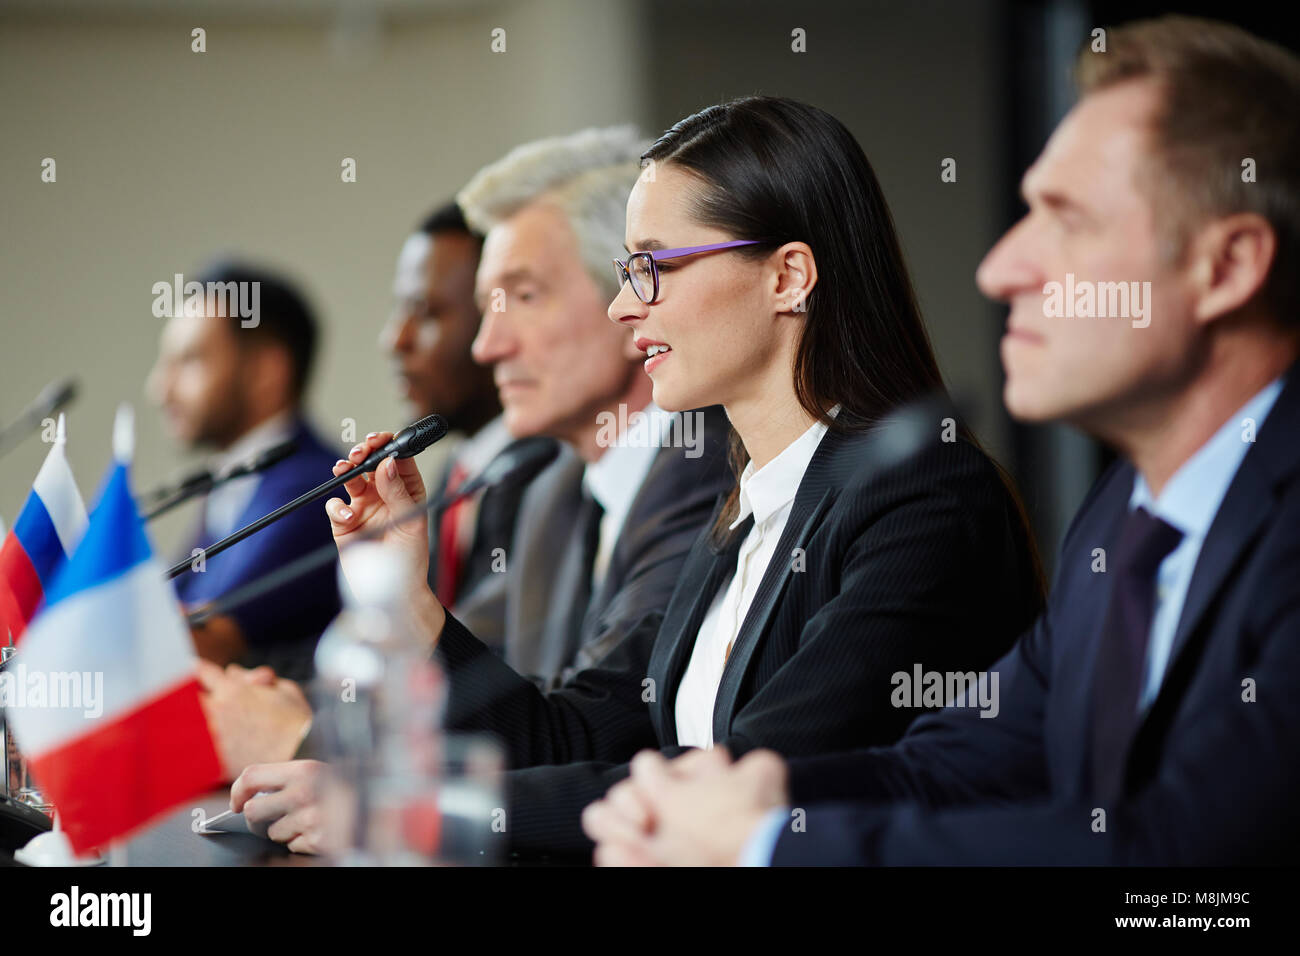 Report of female politician - Stock Image